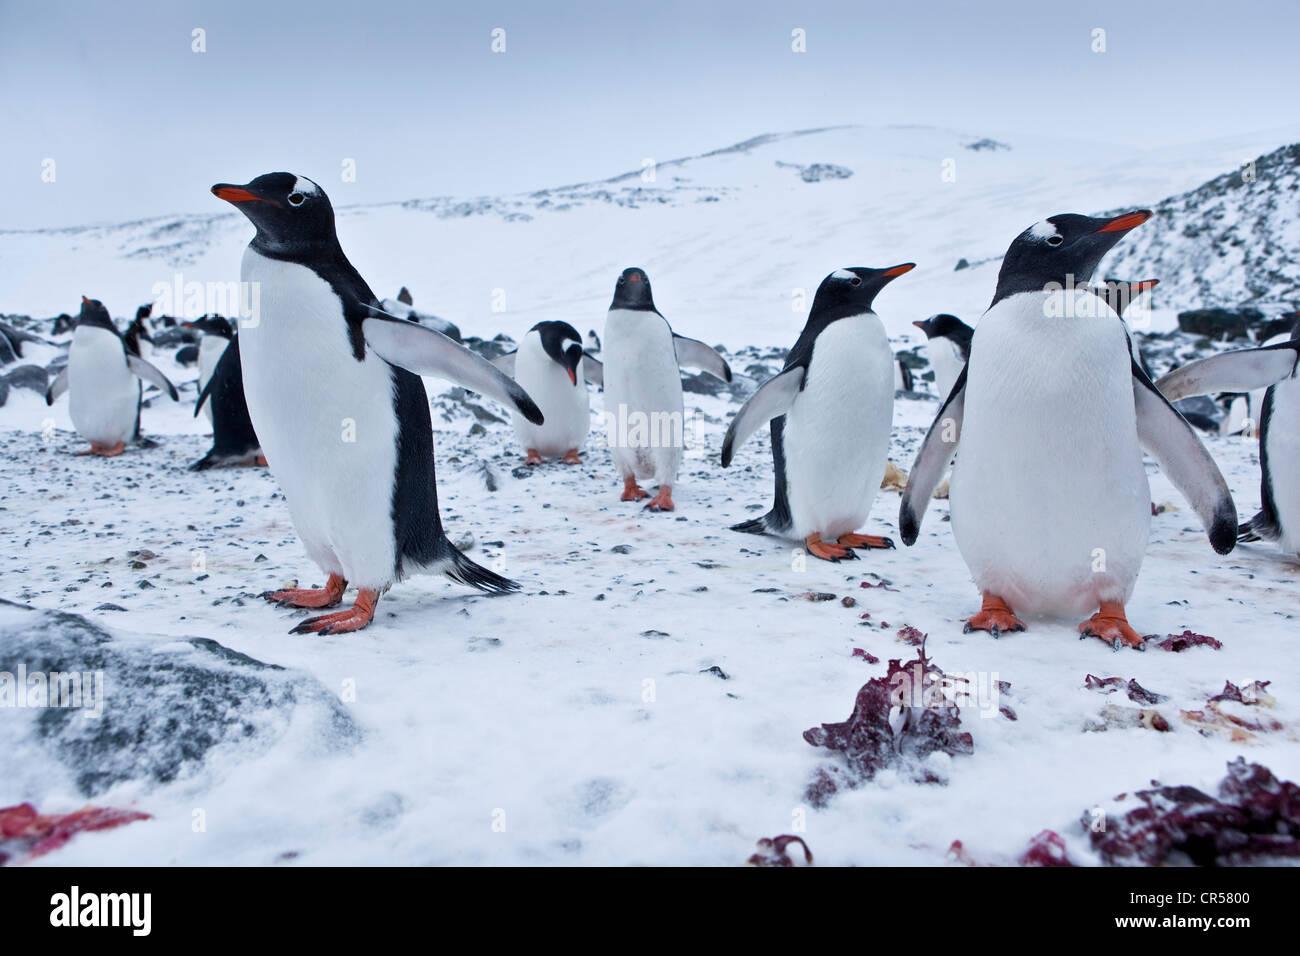 Gentoo Penguins (Pygoscelis papua), colony, Antarctic Region, Antarctica - Stock Image